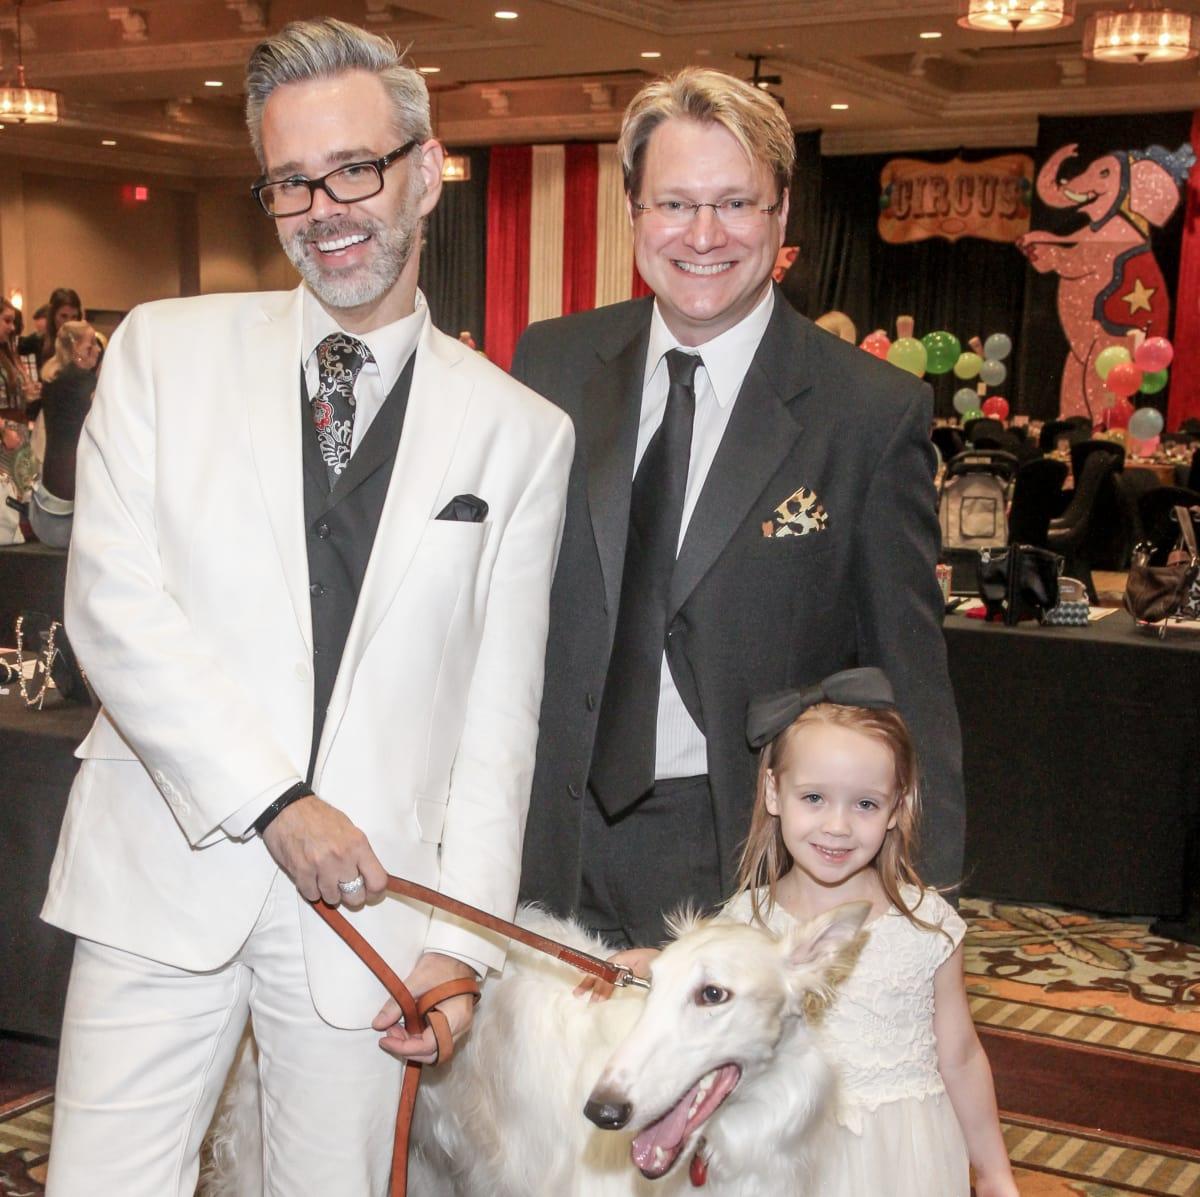 Citizens for Animal Protection 6/16 Michael Pearce, Matt Burrus, Estelle